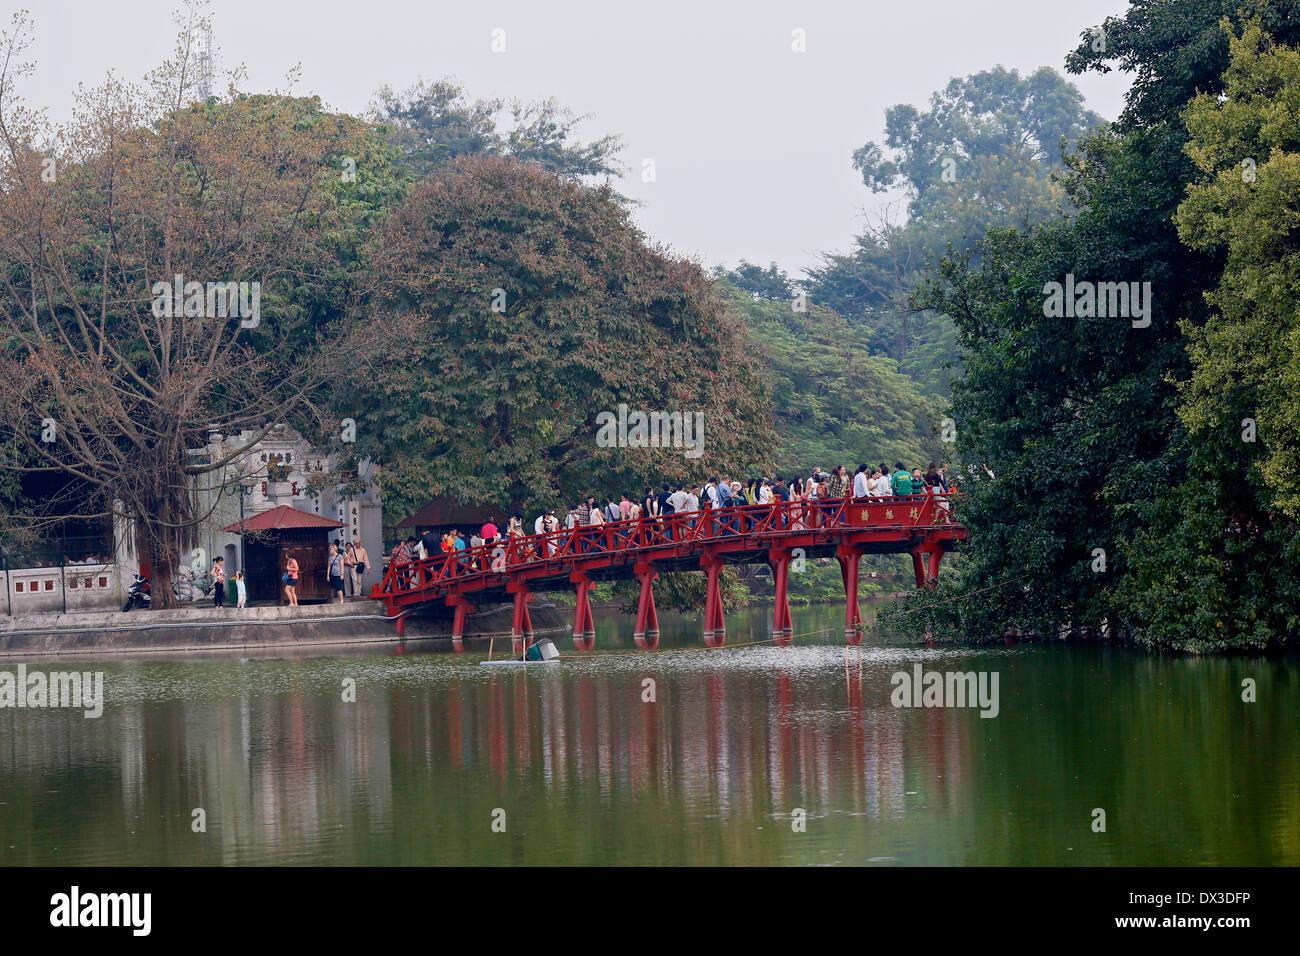 Crowds across the whole bridge to the Ngoc son Temple  on Hoan Kiem Lake. Hanoi, Vietnam, South East Asia - Stock Image